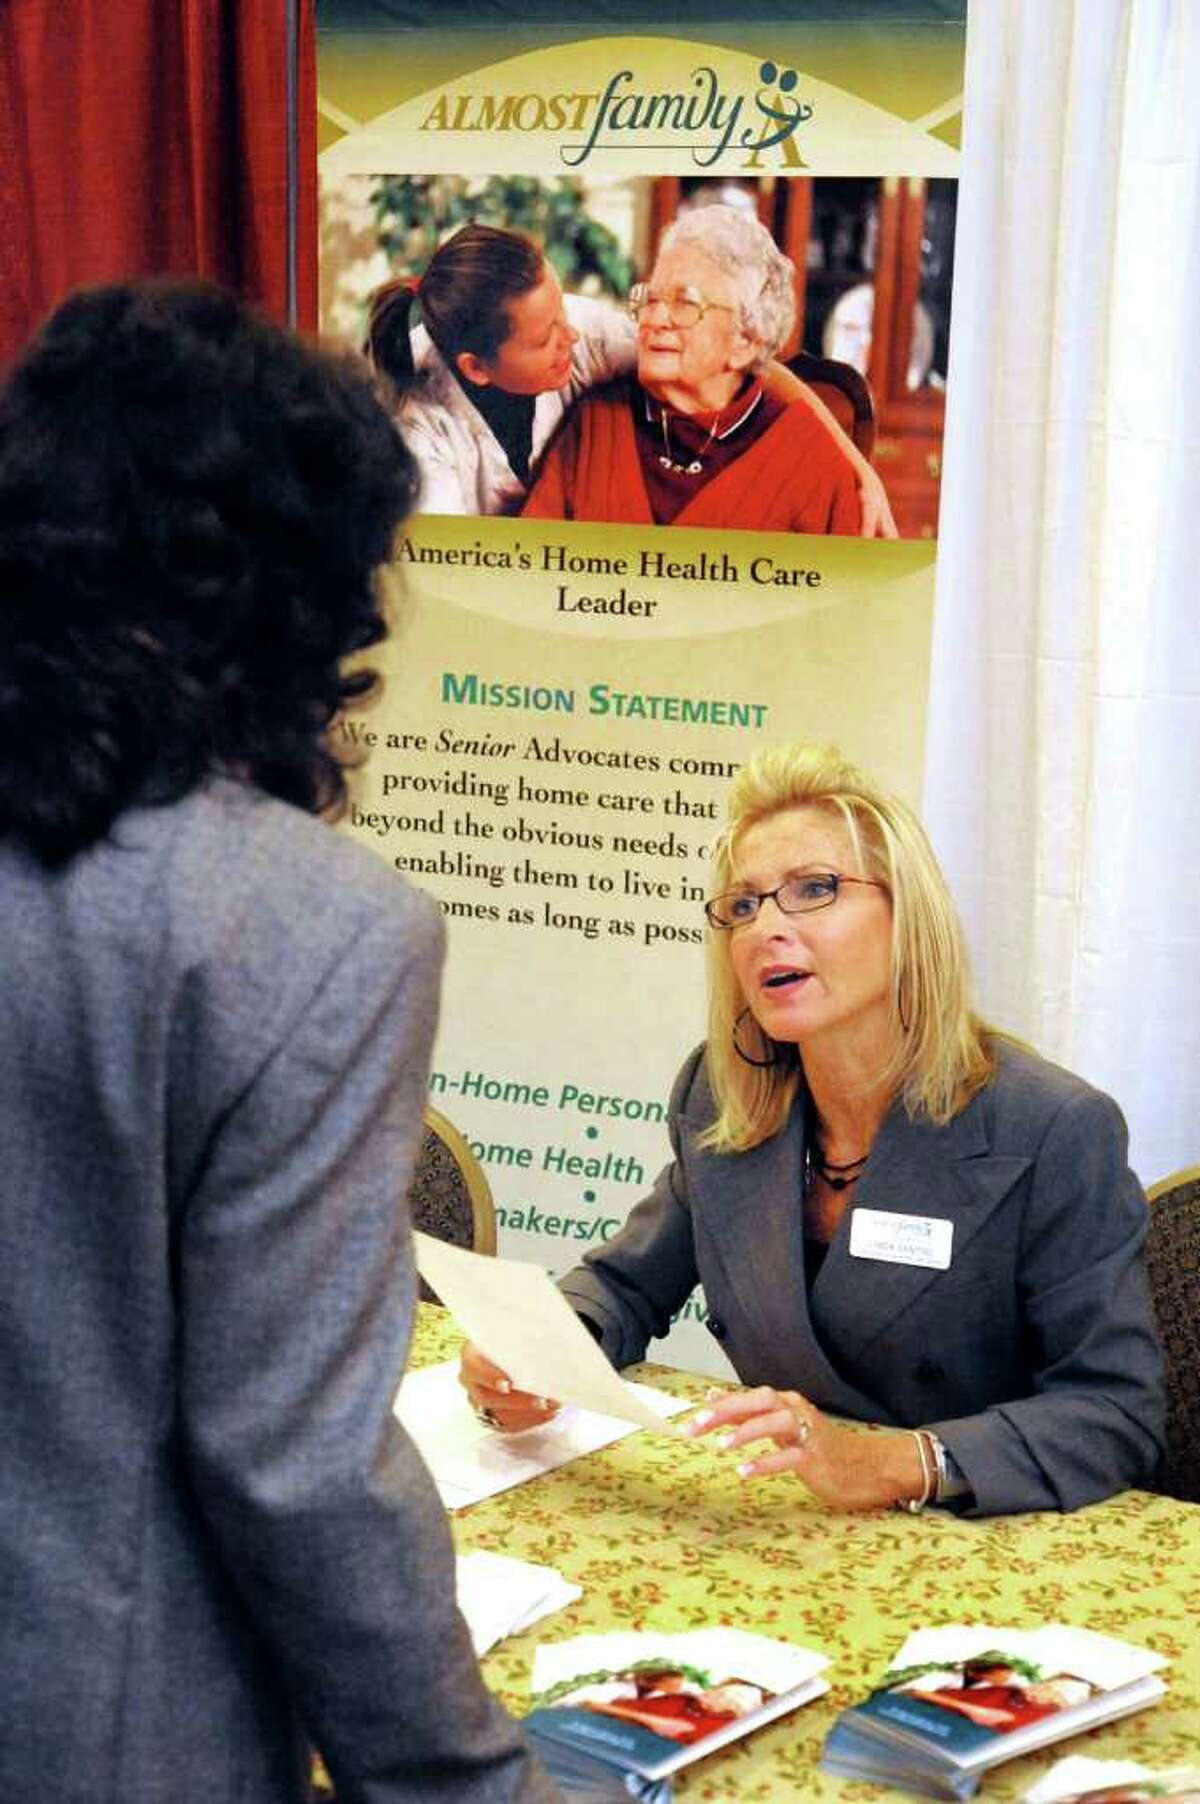 Linda Santini, of Almost Family, talks to a job-seeker during Career Fair 2011 at the Ethan Allen Inn in Danbury Monday, Sept. 26, 2011.